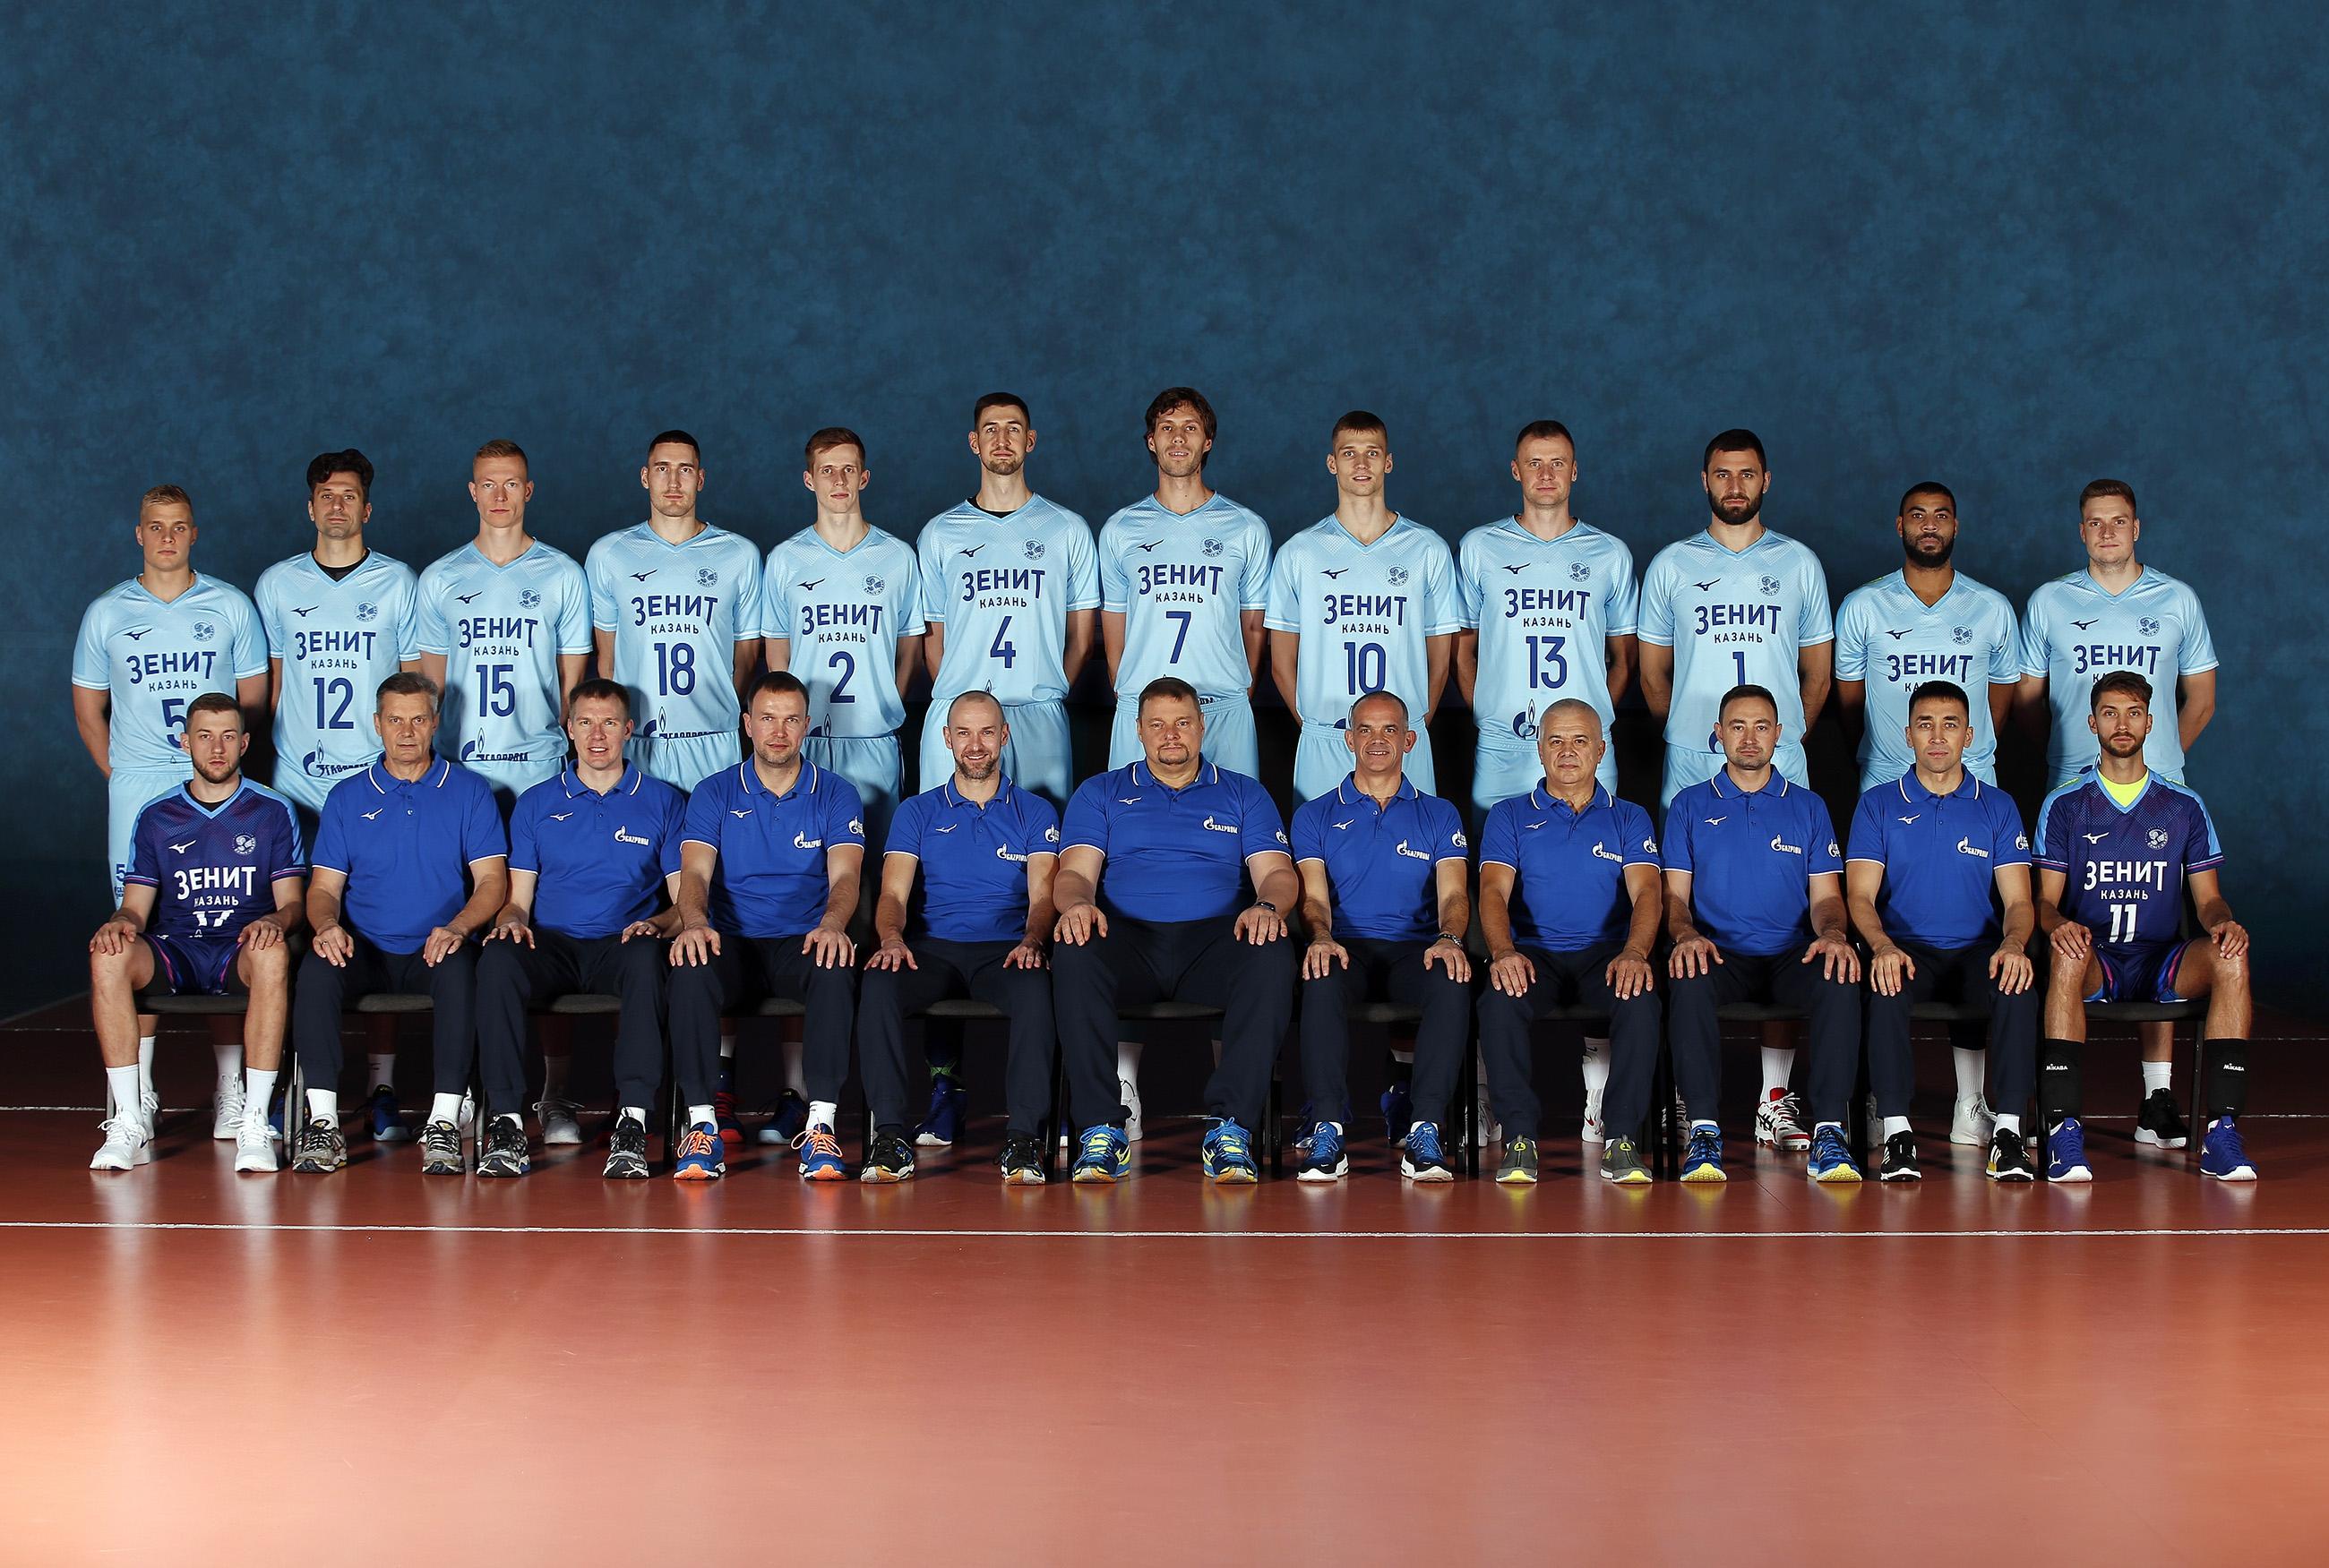 Overview Zenit Kazan Rus Fivb Volleyball Men S Club World Championship 2019